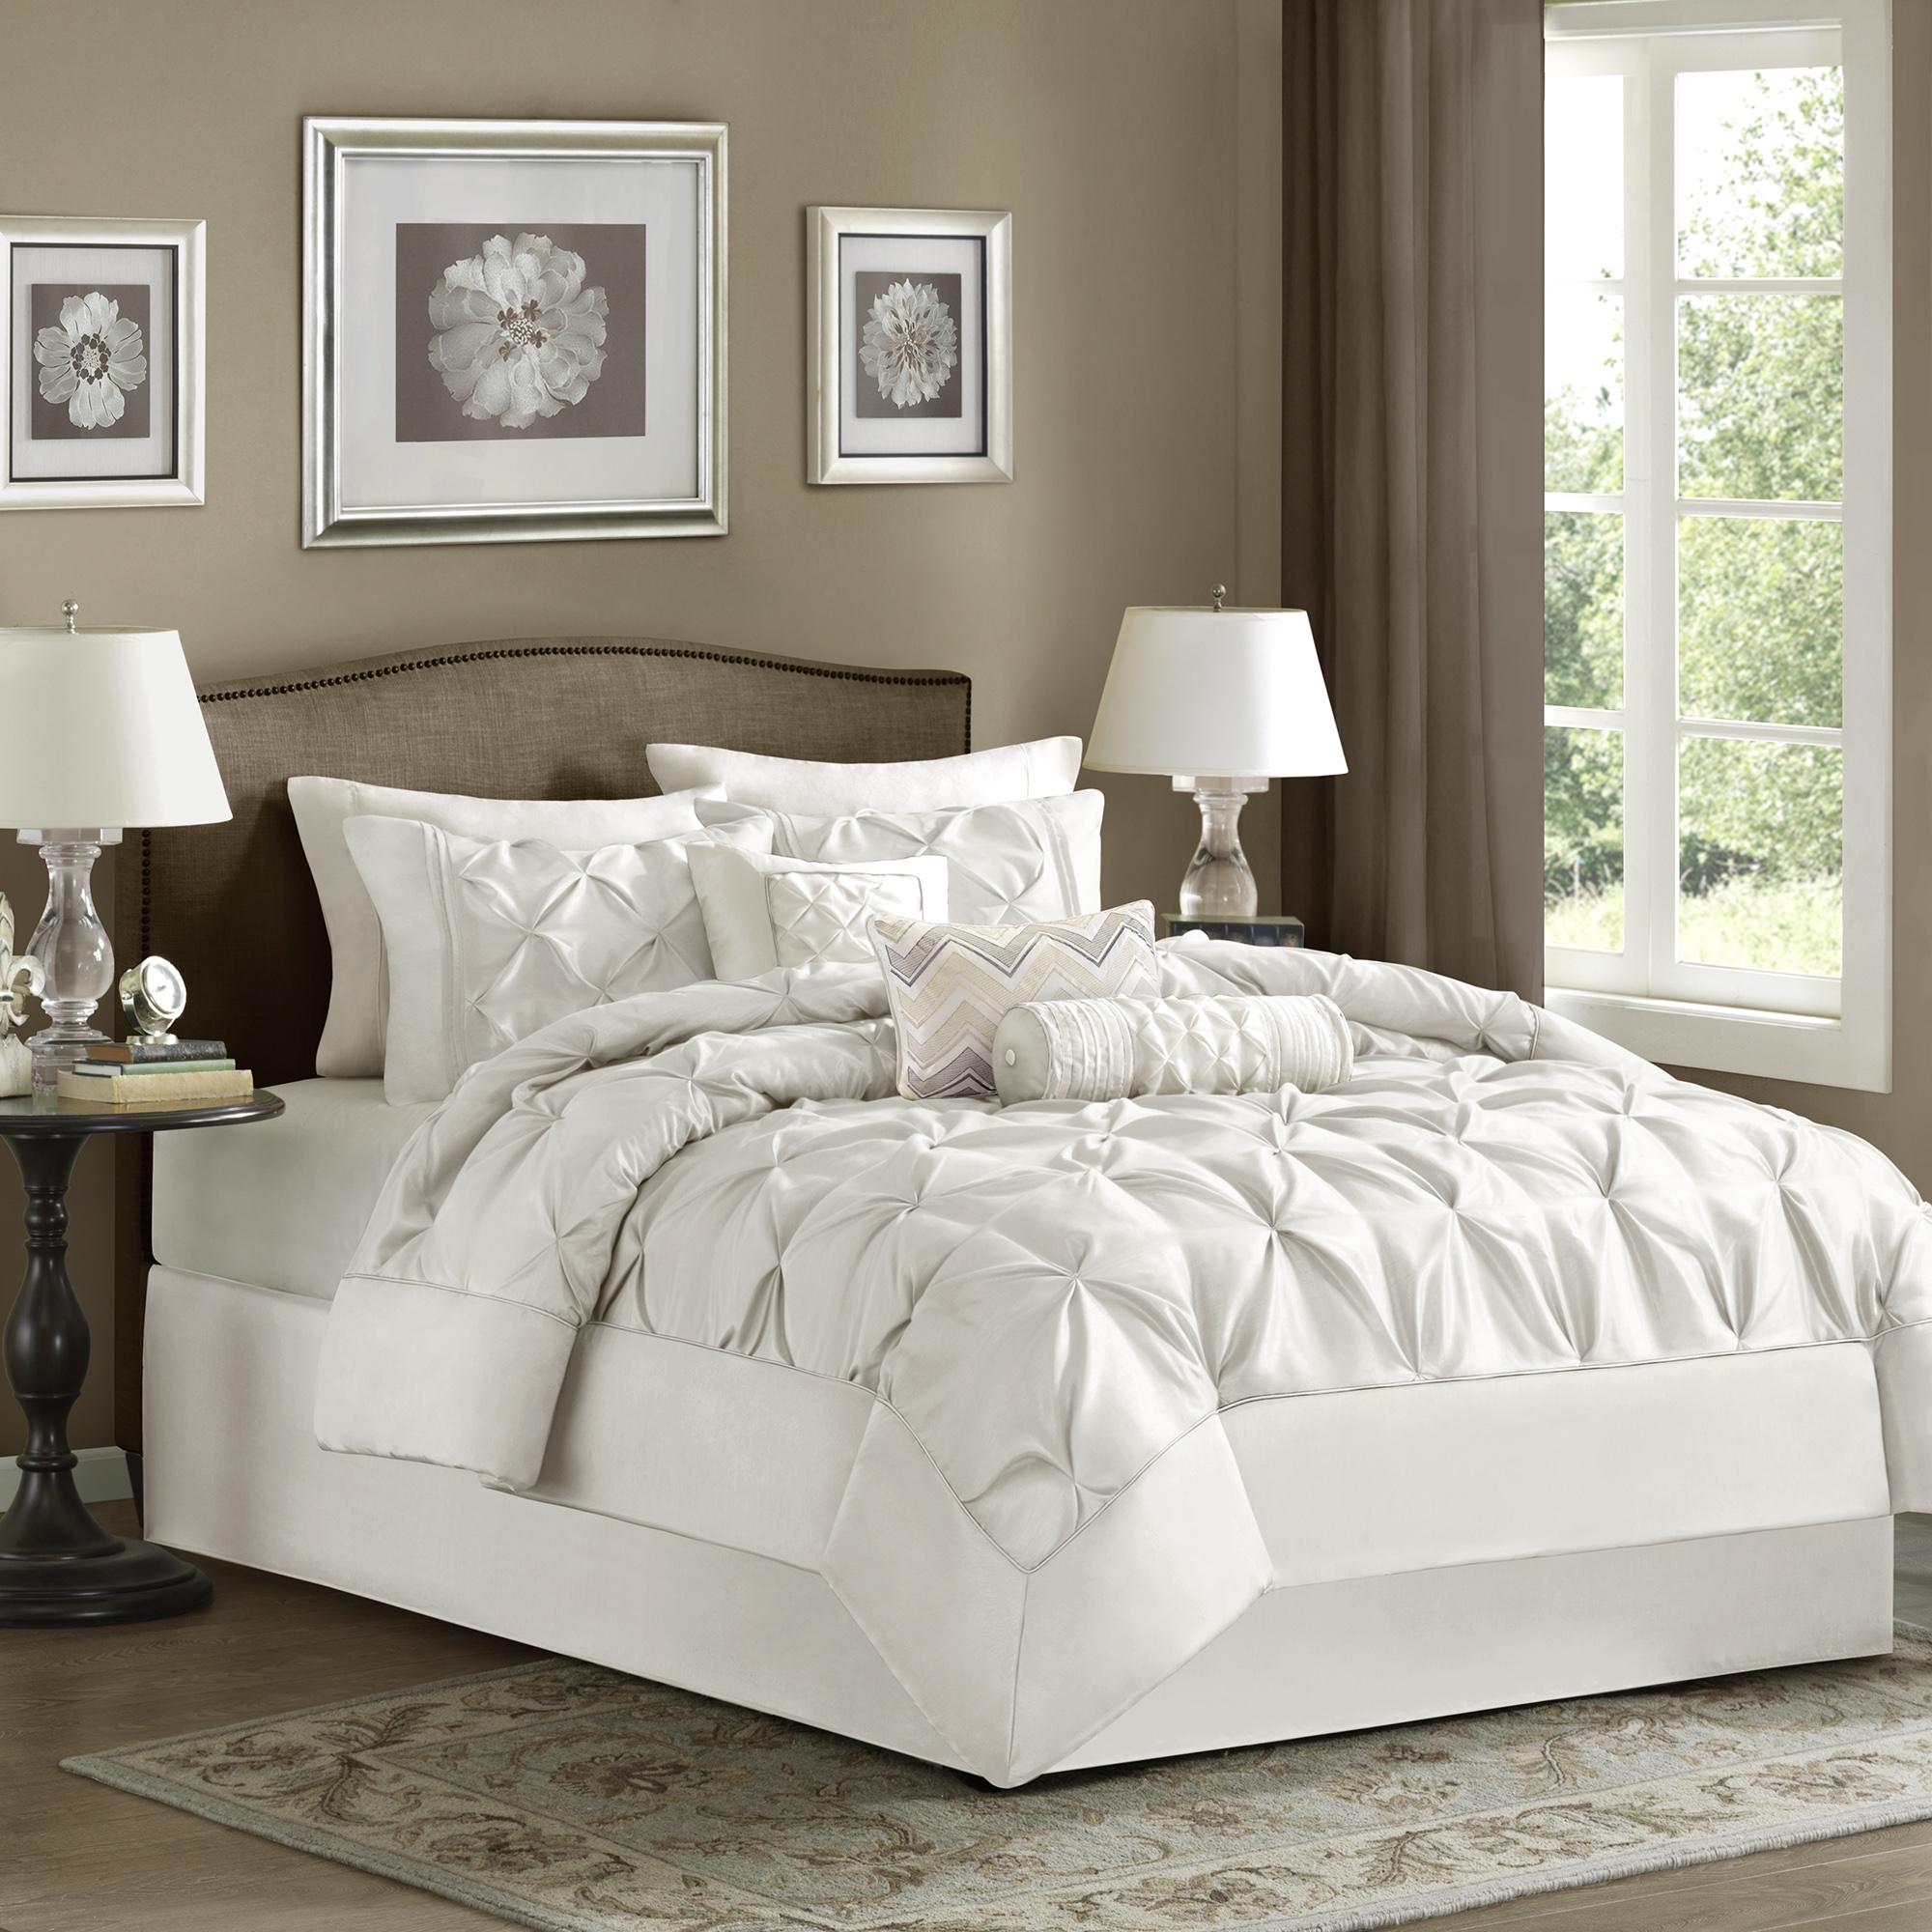 Piedmont Comforter Set (Full) White - 7pc